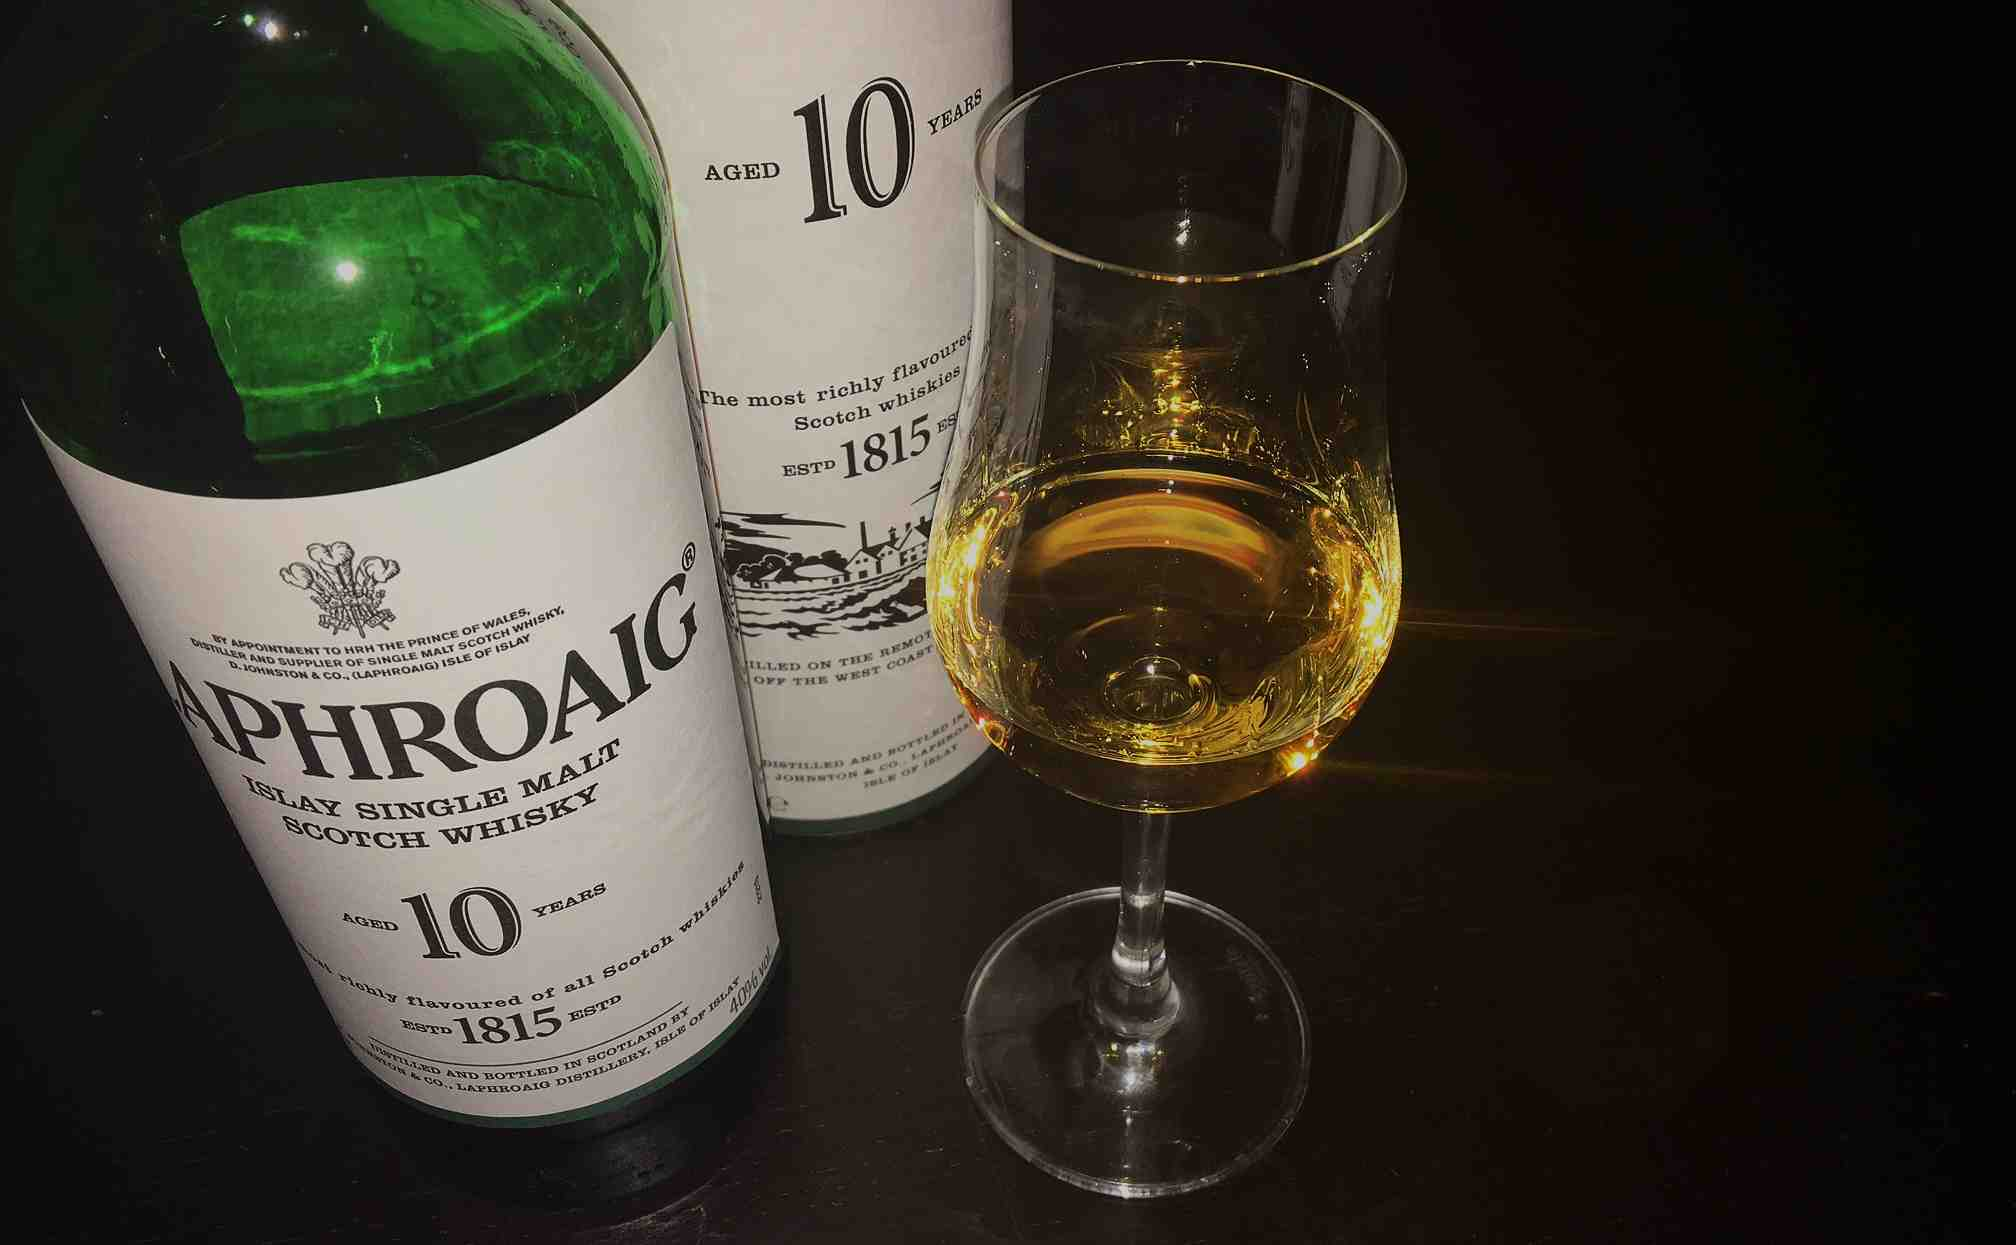 Laphroaig 10 Jahre Islay Single Malt Scotch